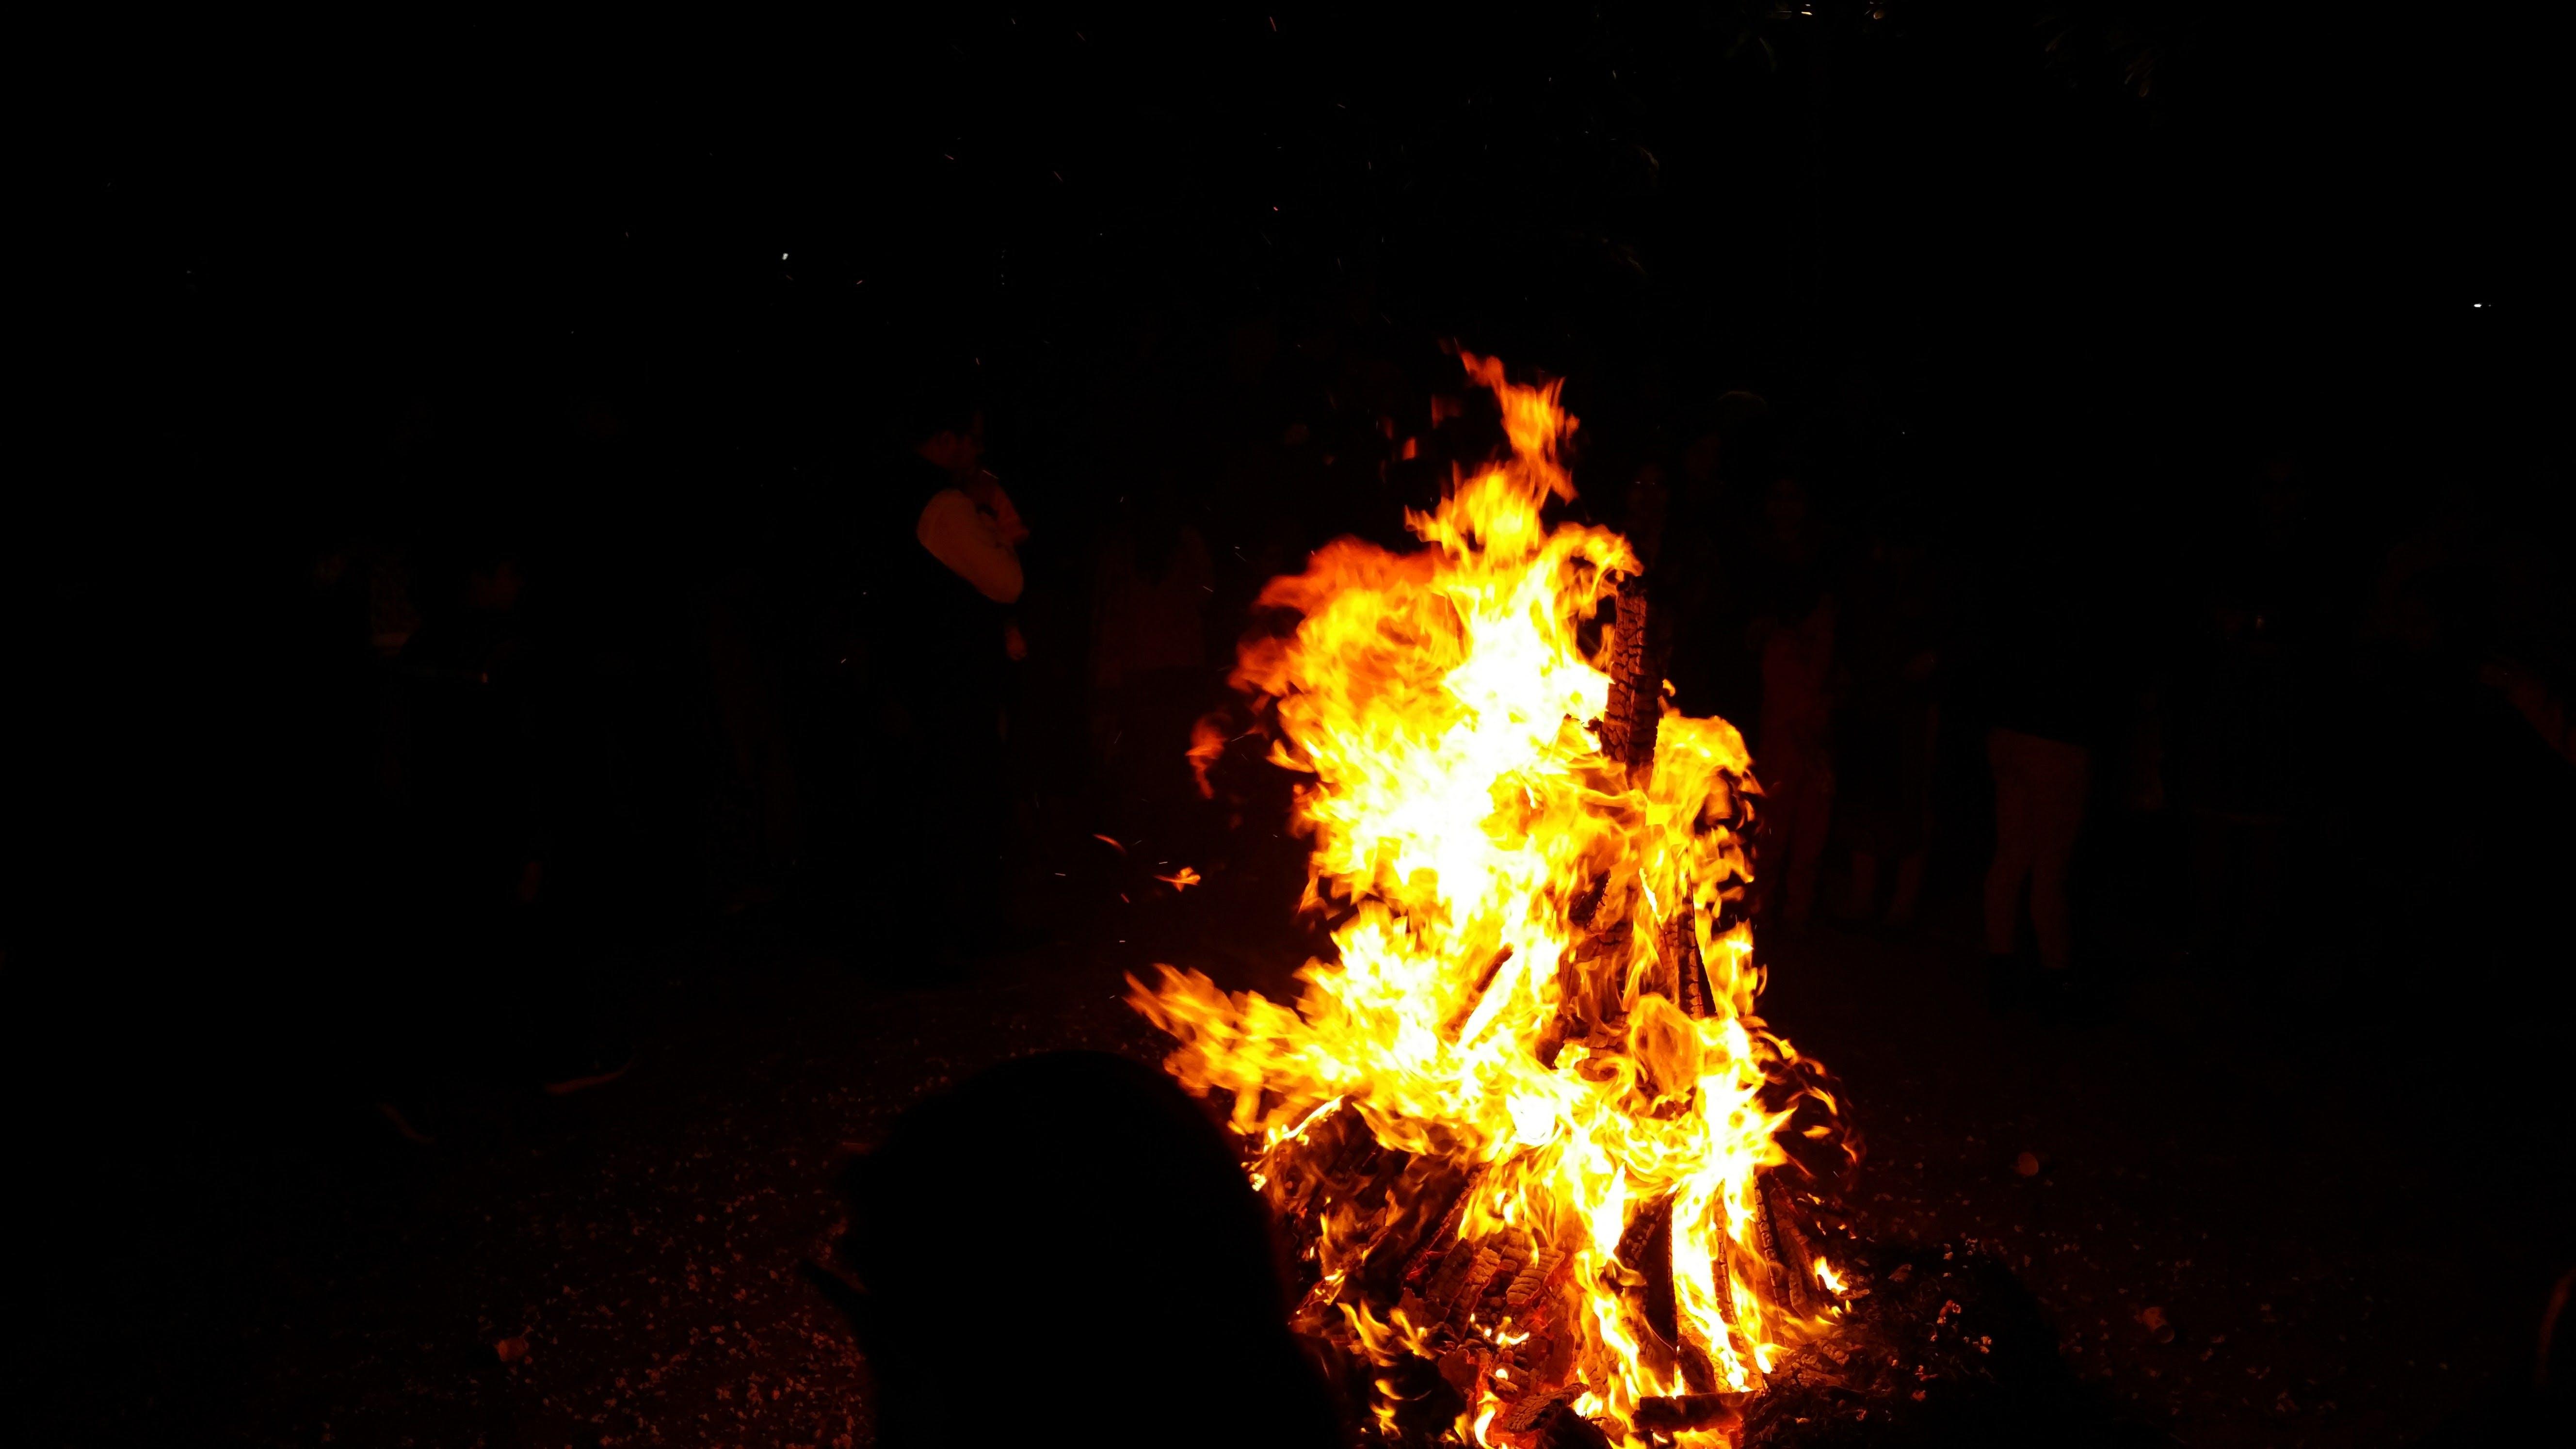 blaze, blazing, bonfire